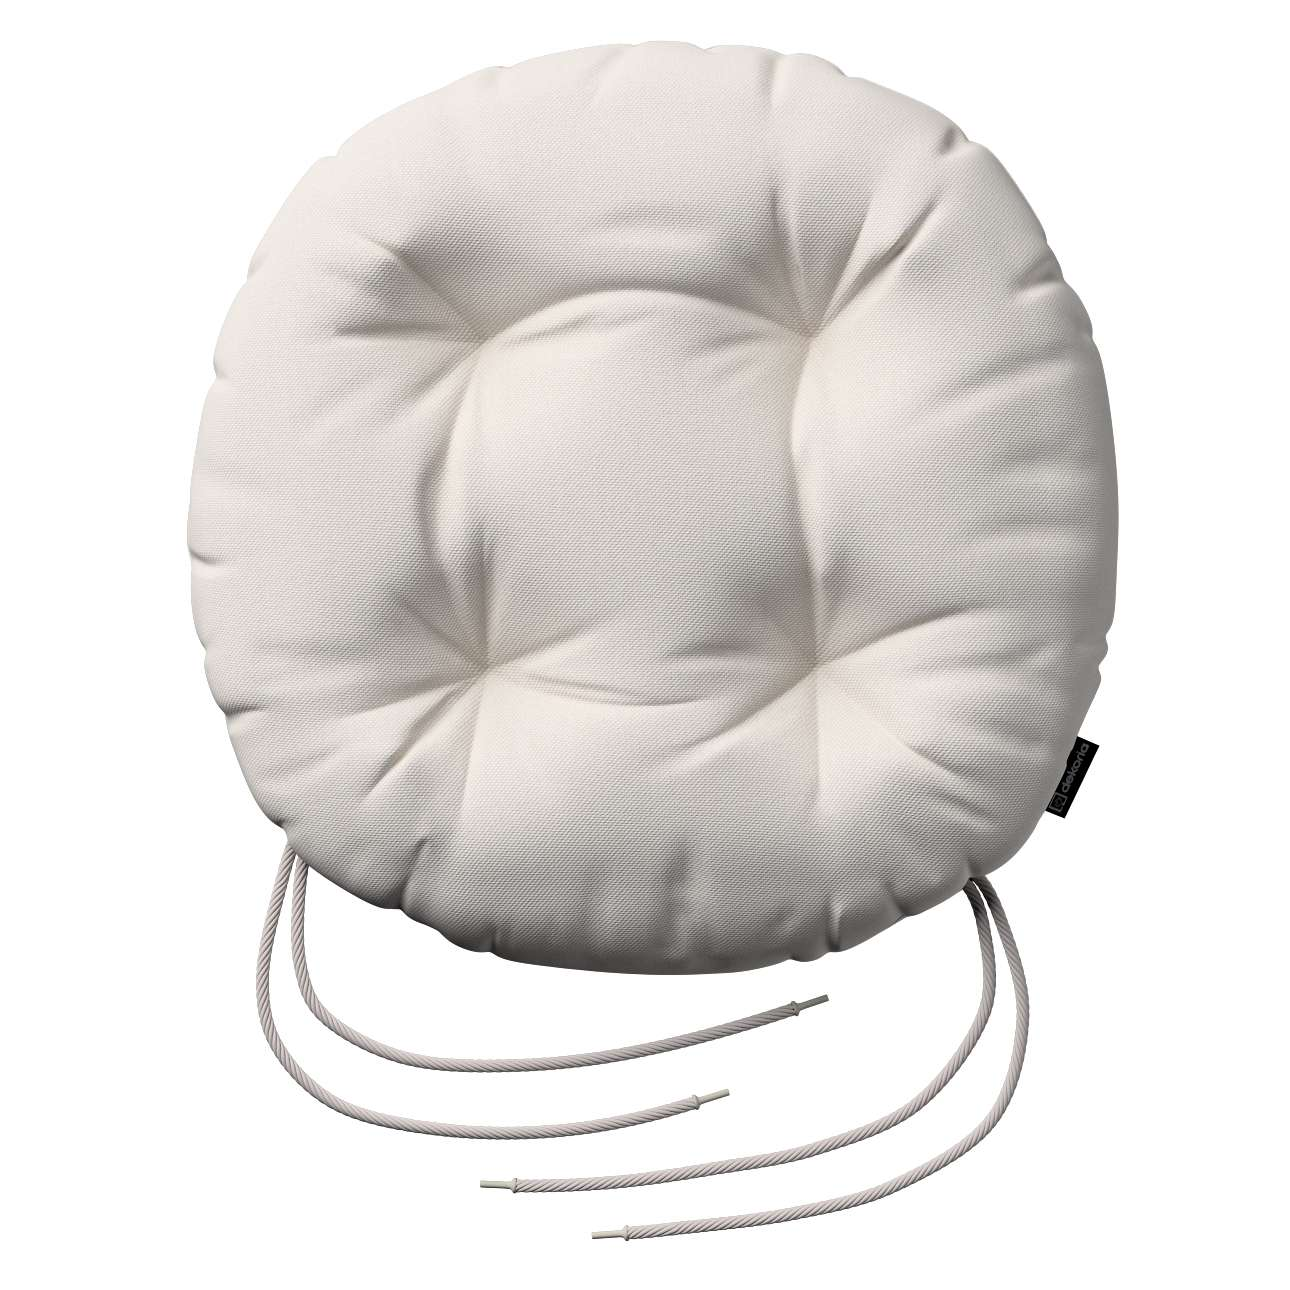 Kėdės pagalvėlė Adam  skersmuo 37x8cm kolekcijoje Etna , audinys: 705-01